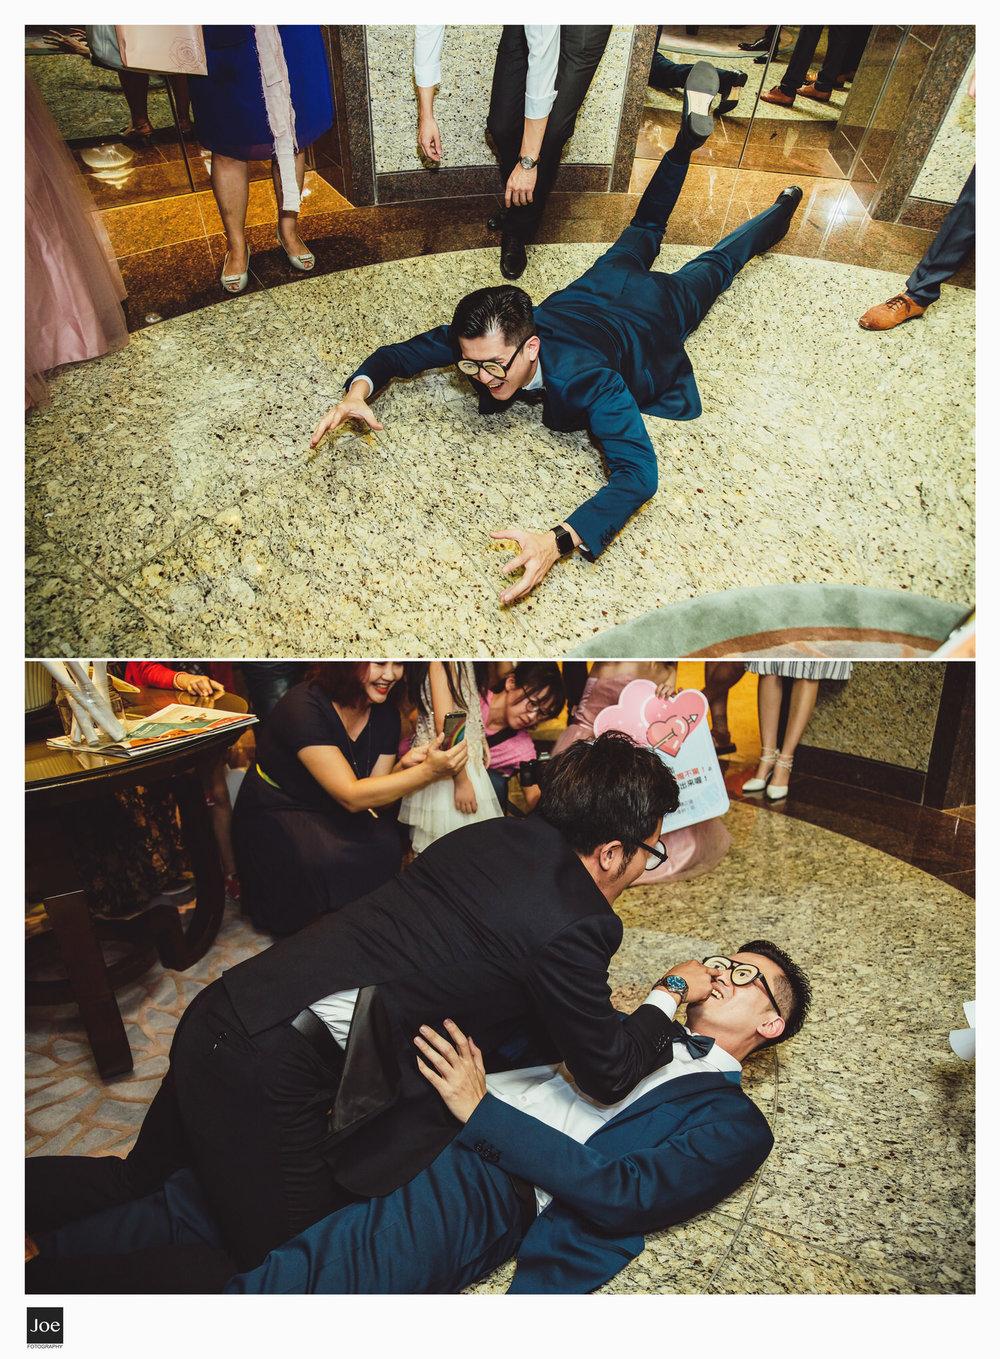 wedding-photography-shangri-la-far-eastern-plaza-hotel-ariel-sam-joe-fotography-052.jpg